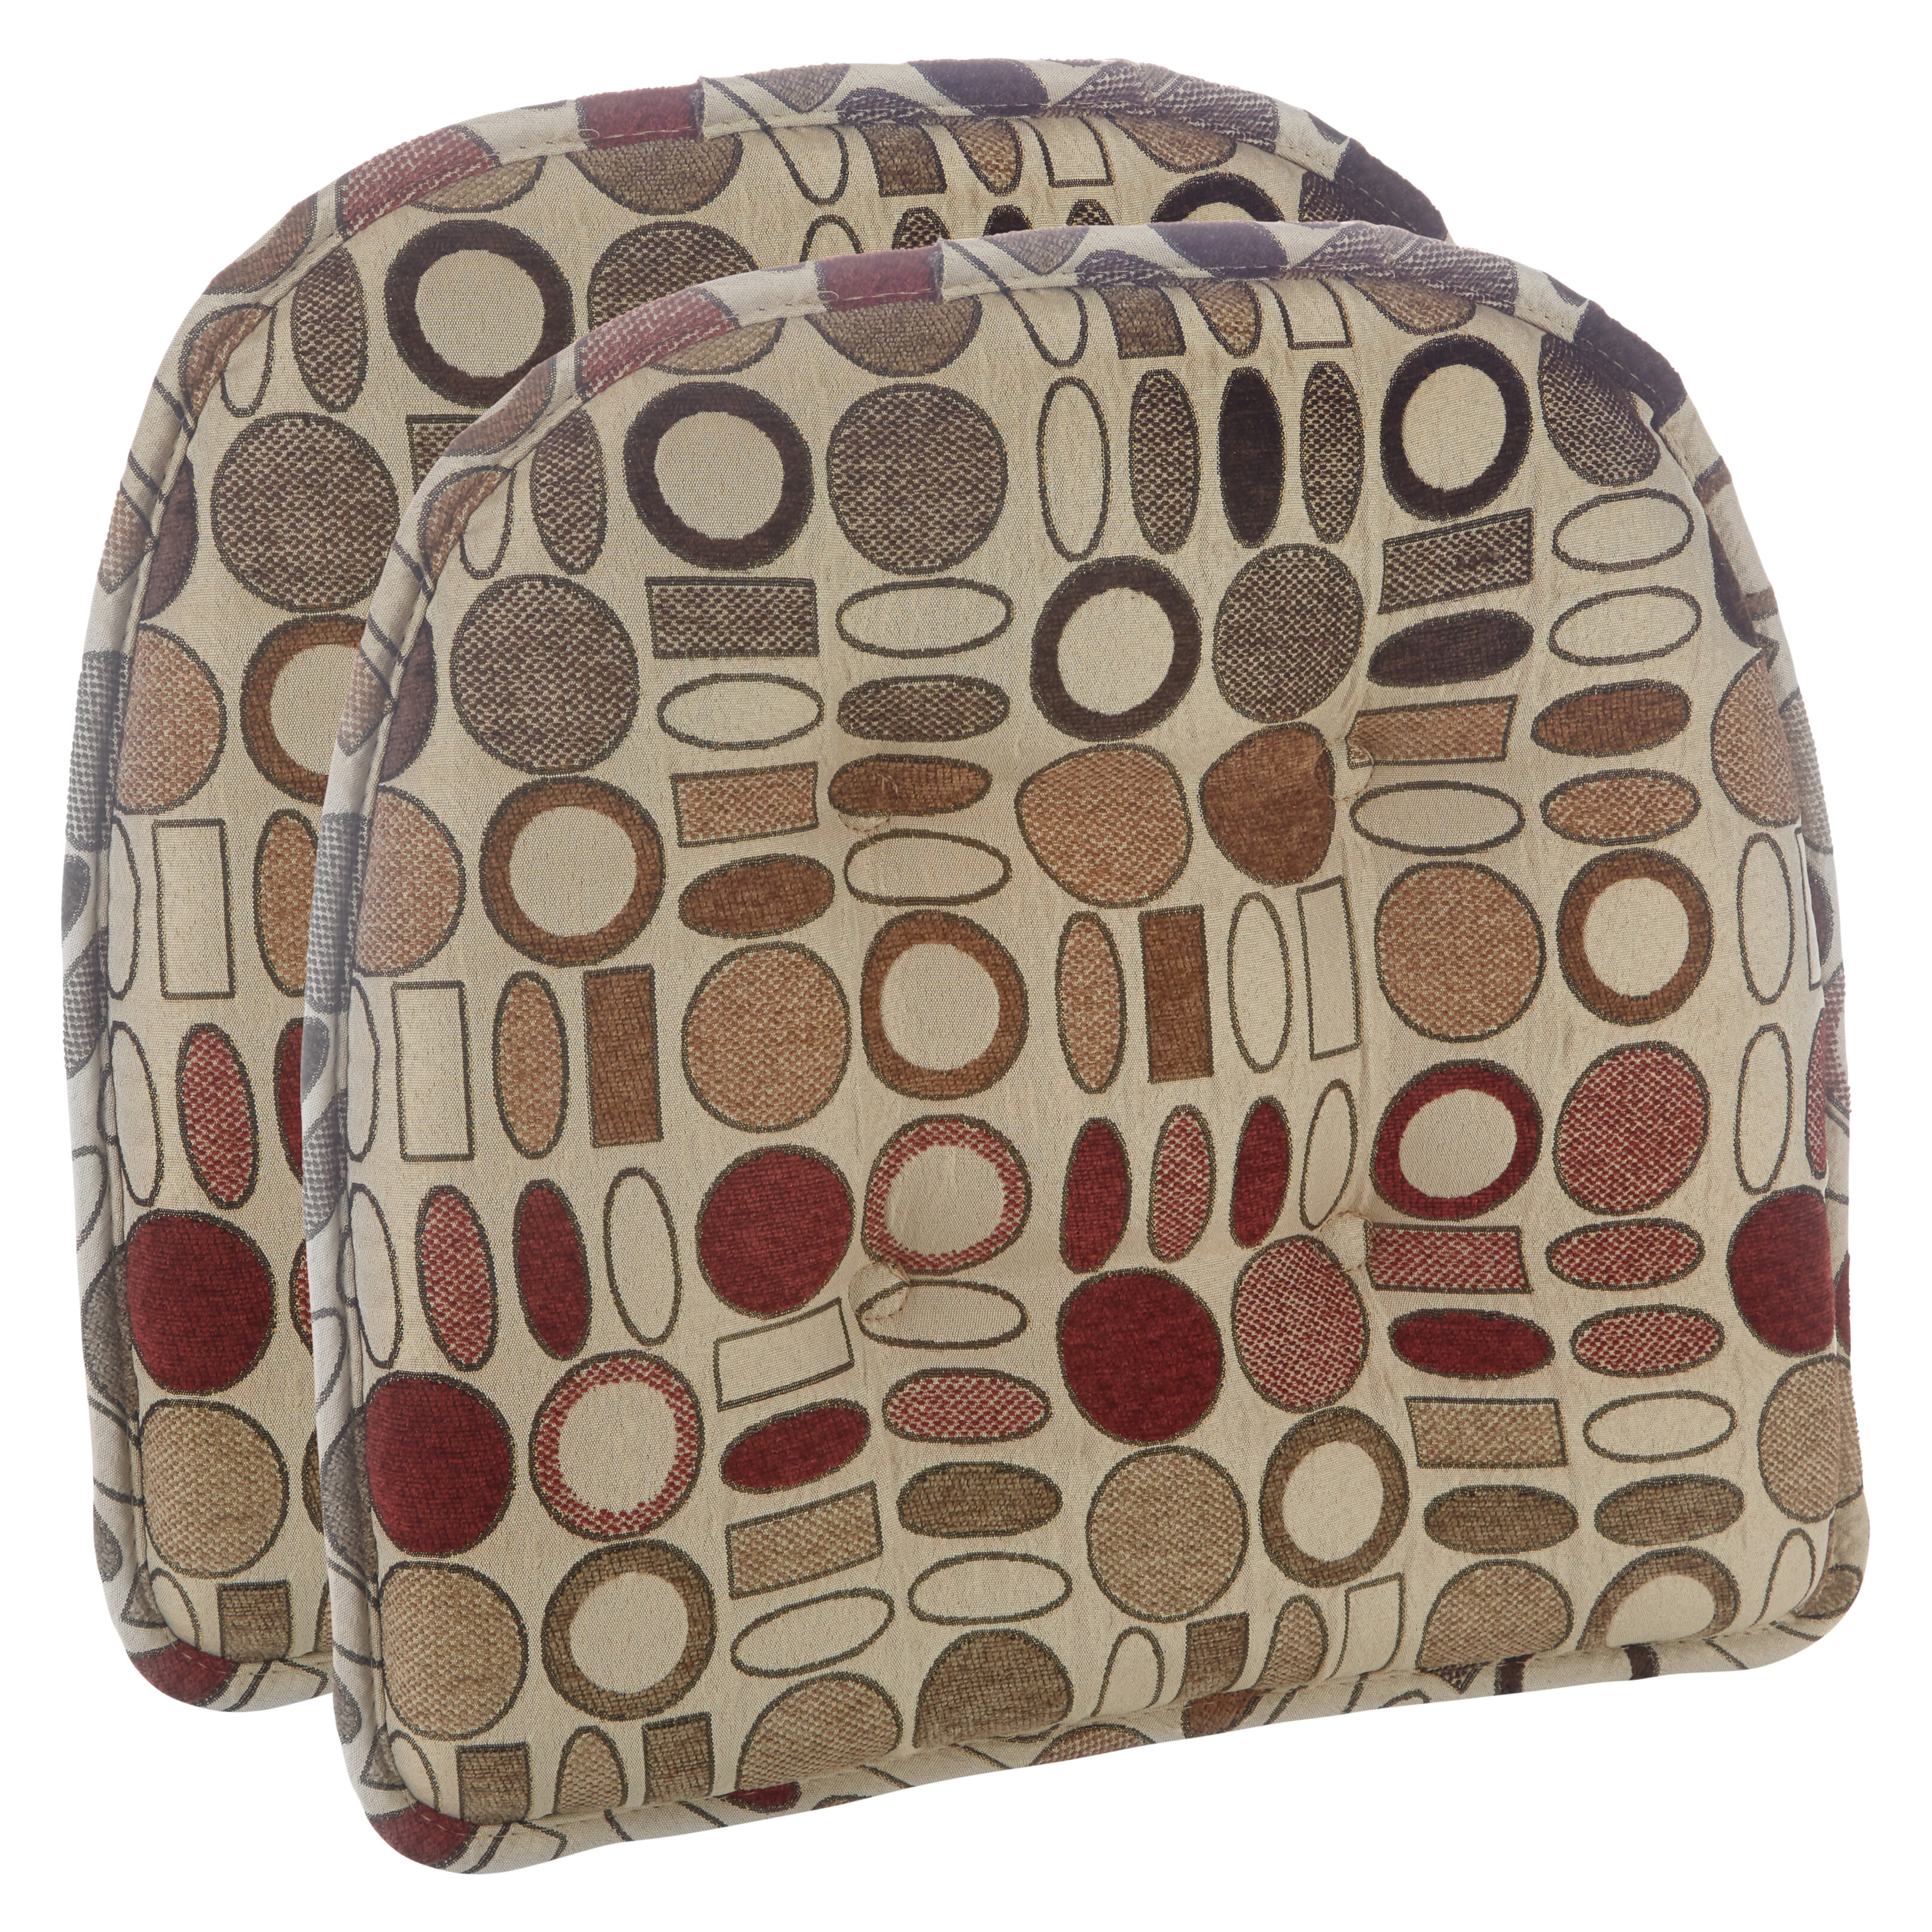 Winston Porter Alkea Gripper Non Slip Indoor Dining Chair Cushion Reviews Wayfair